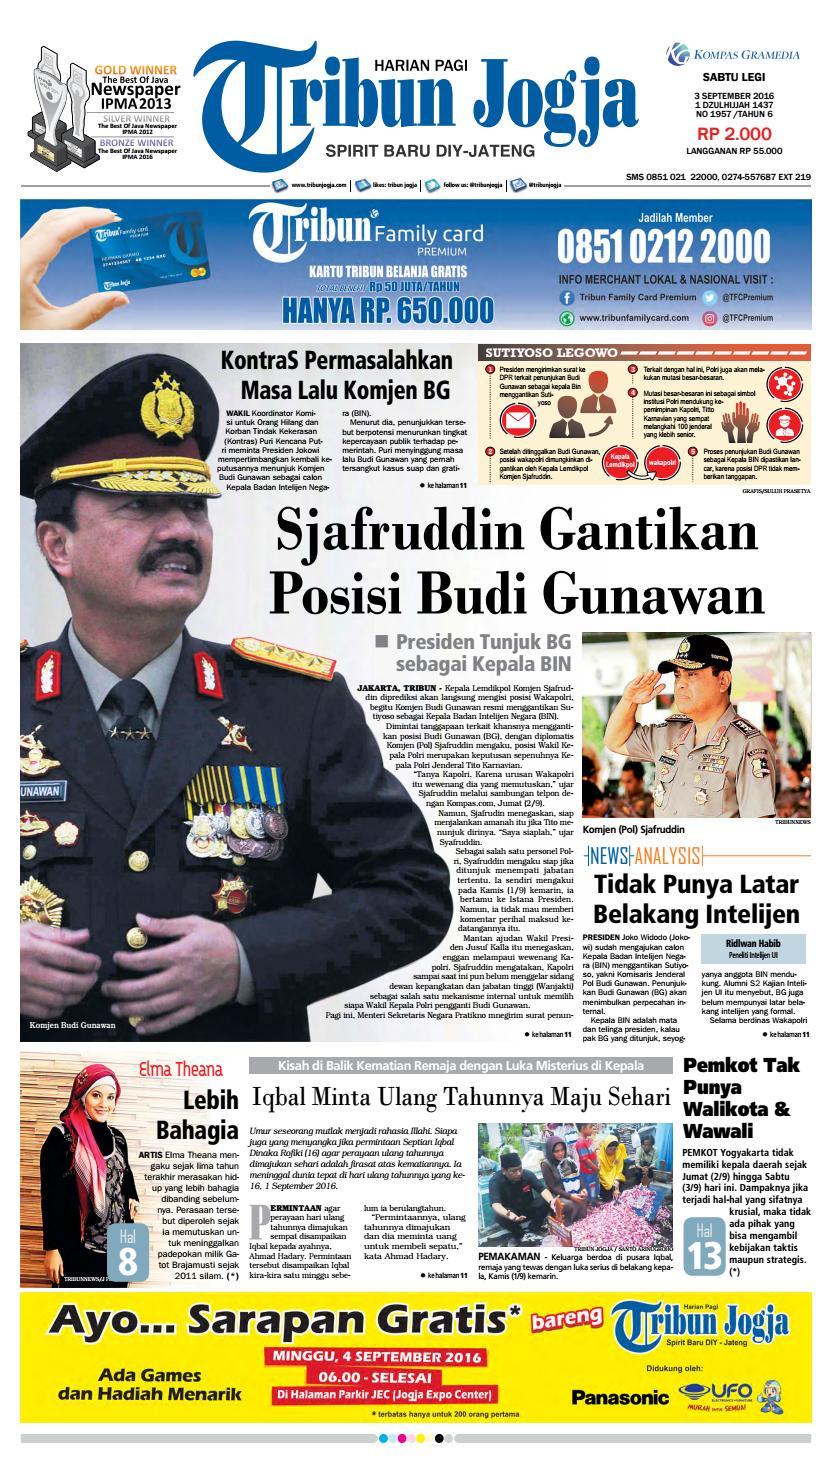 Tribunjogja 03 09 2016 By Tribun Jogja Issuu Snack Gayem Pangsit Bantal Imut Bdg